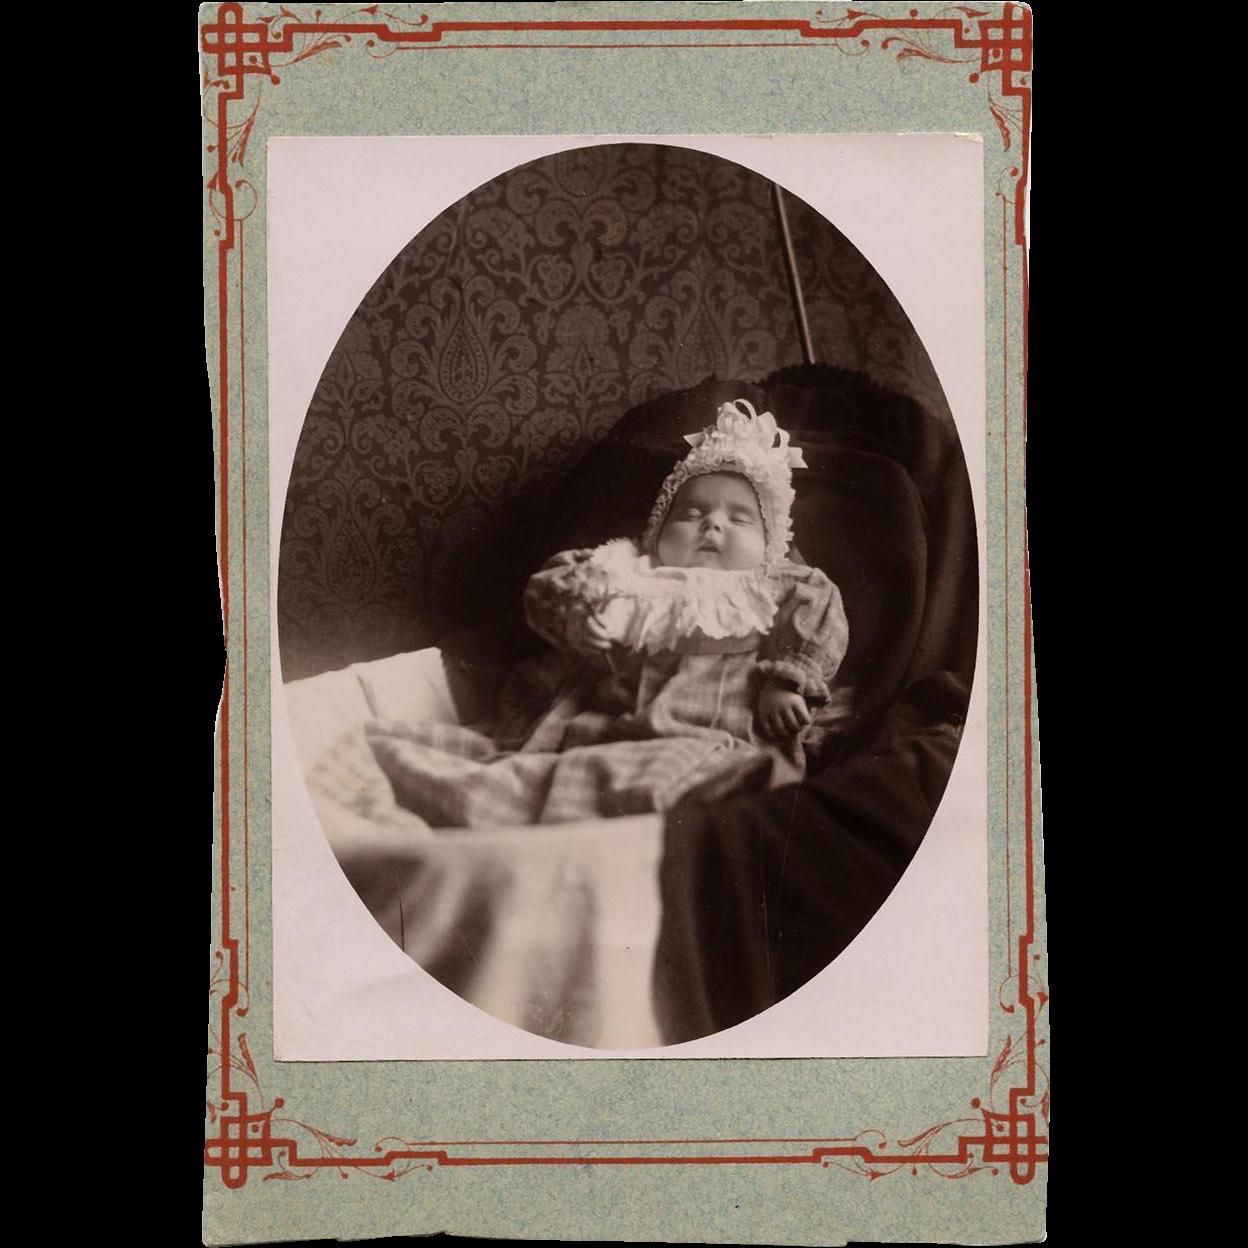 Post-mortem Photograph Baby Holding Dandelion Memorial Portraiture Mourning Portrait